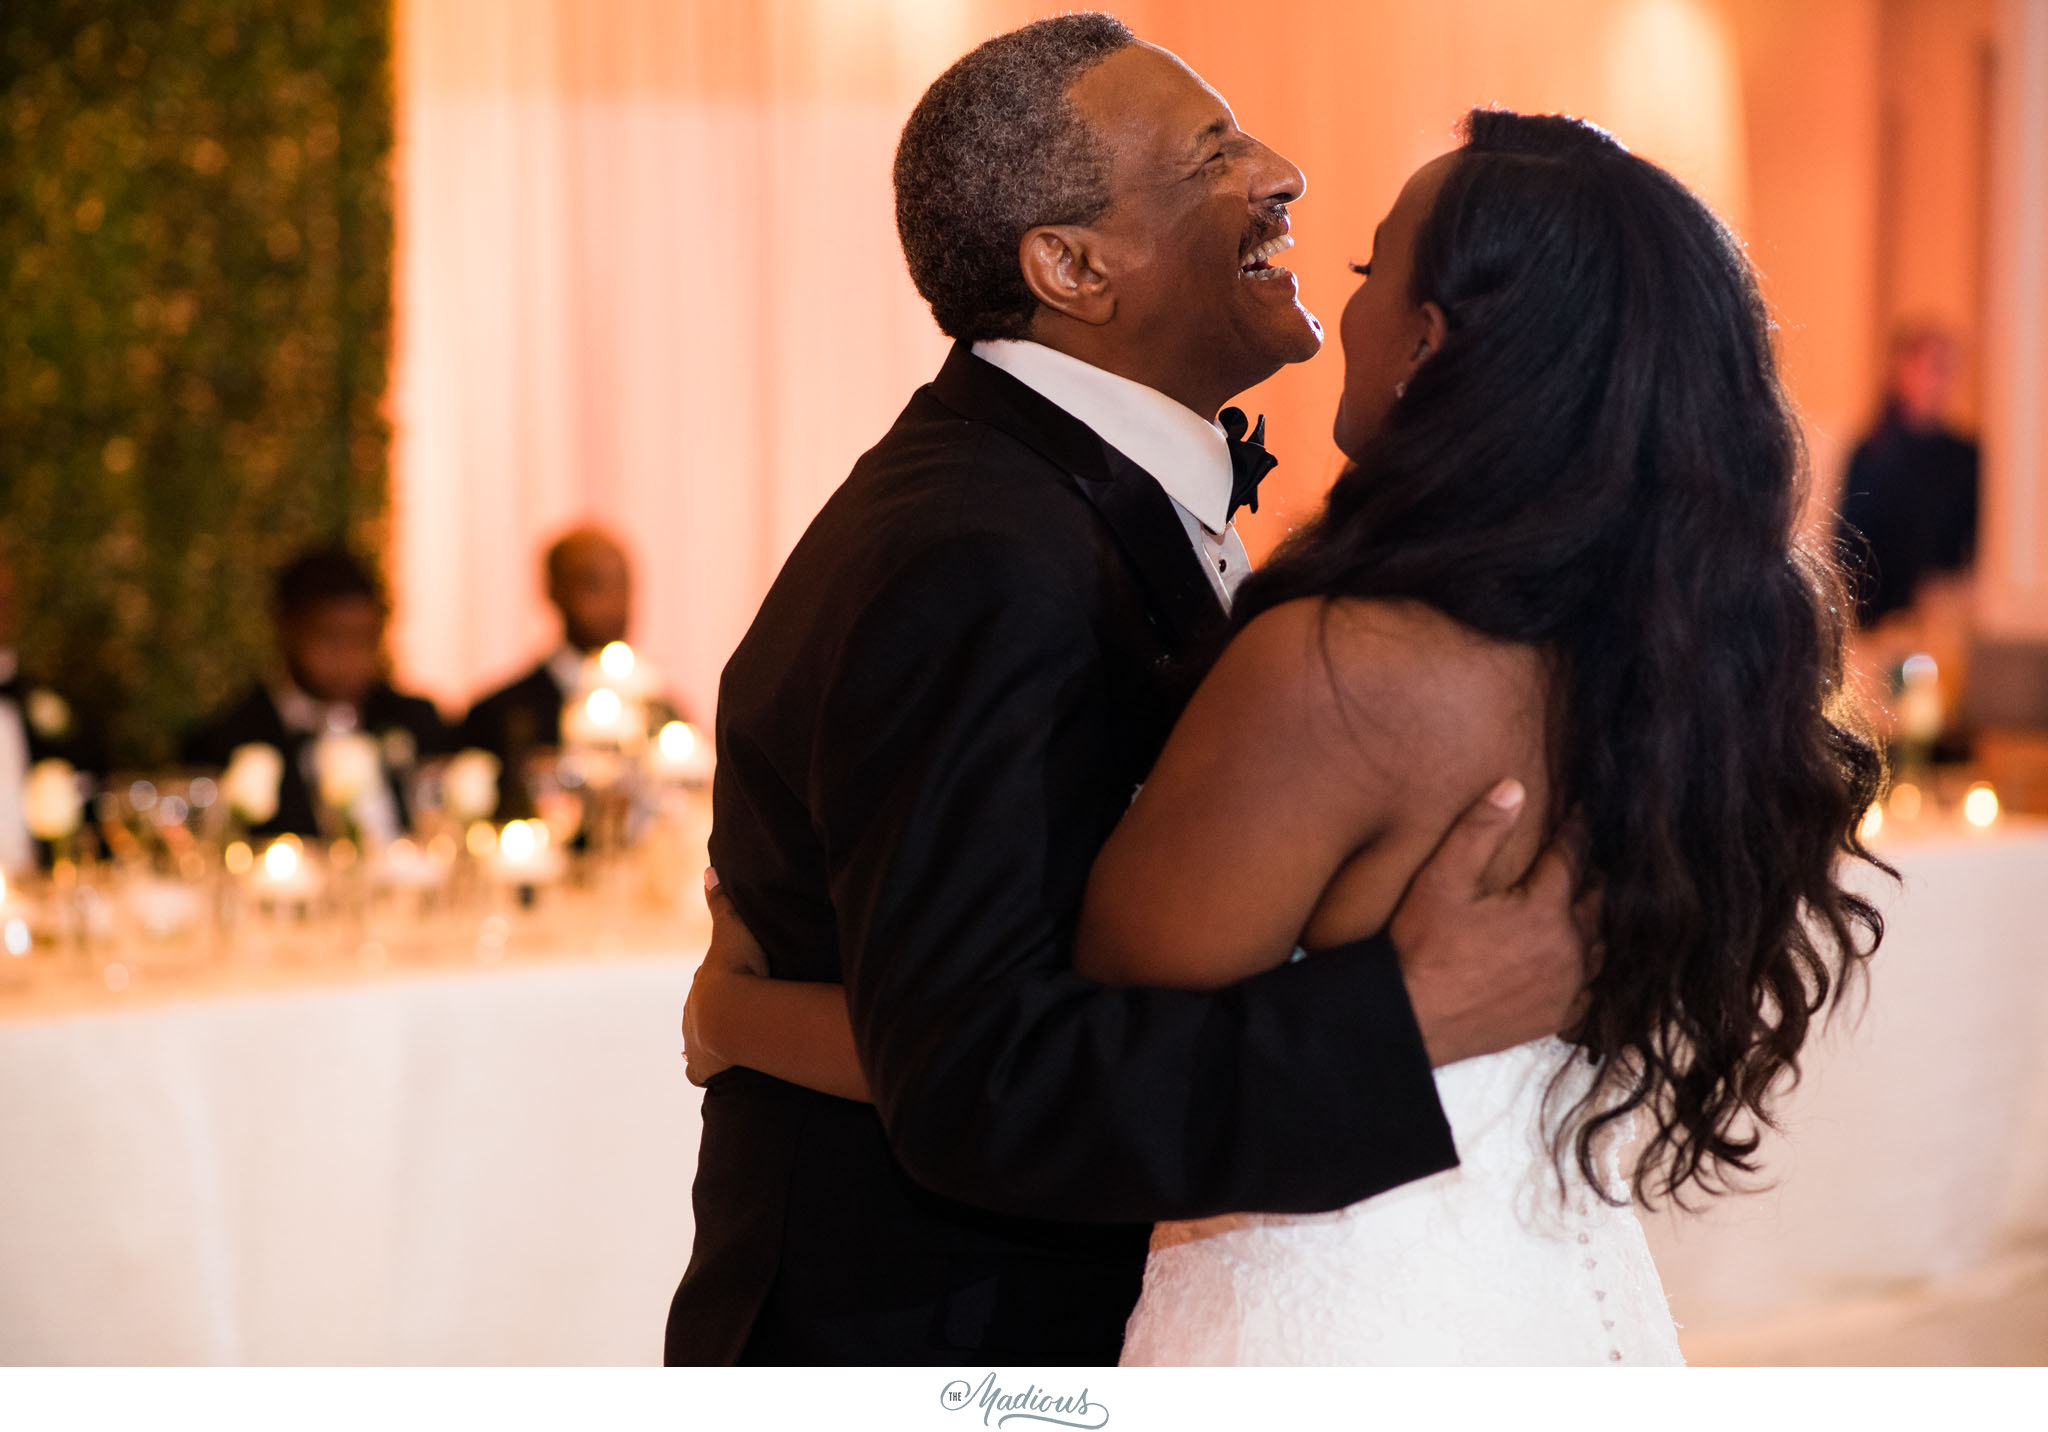 nmwa+wedding,+women+in+the+arts+wedding,+ethiopian+wedding,+dc+wedding+0208.jpg